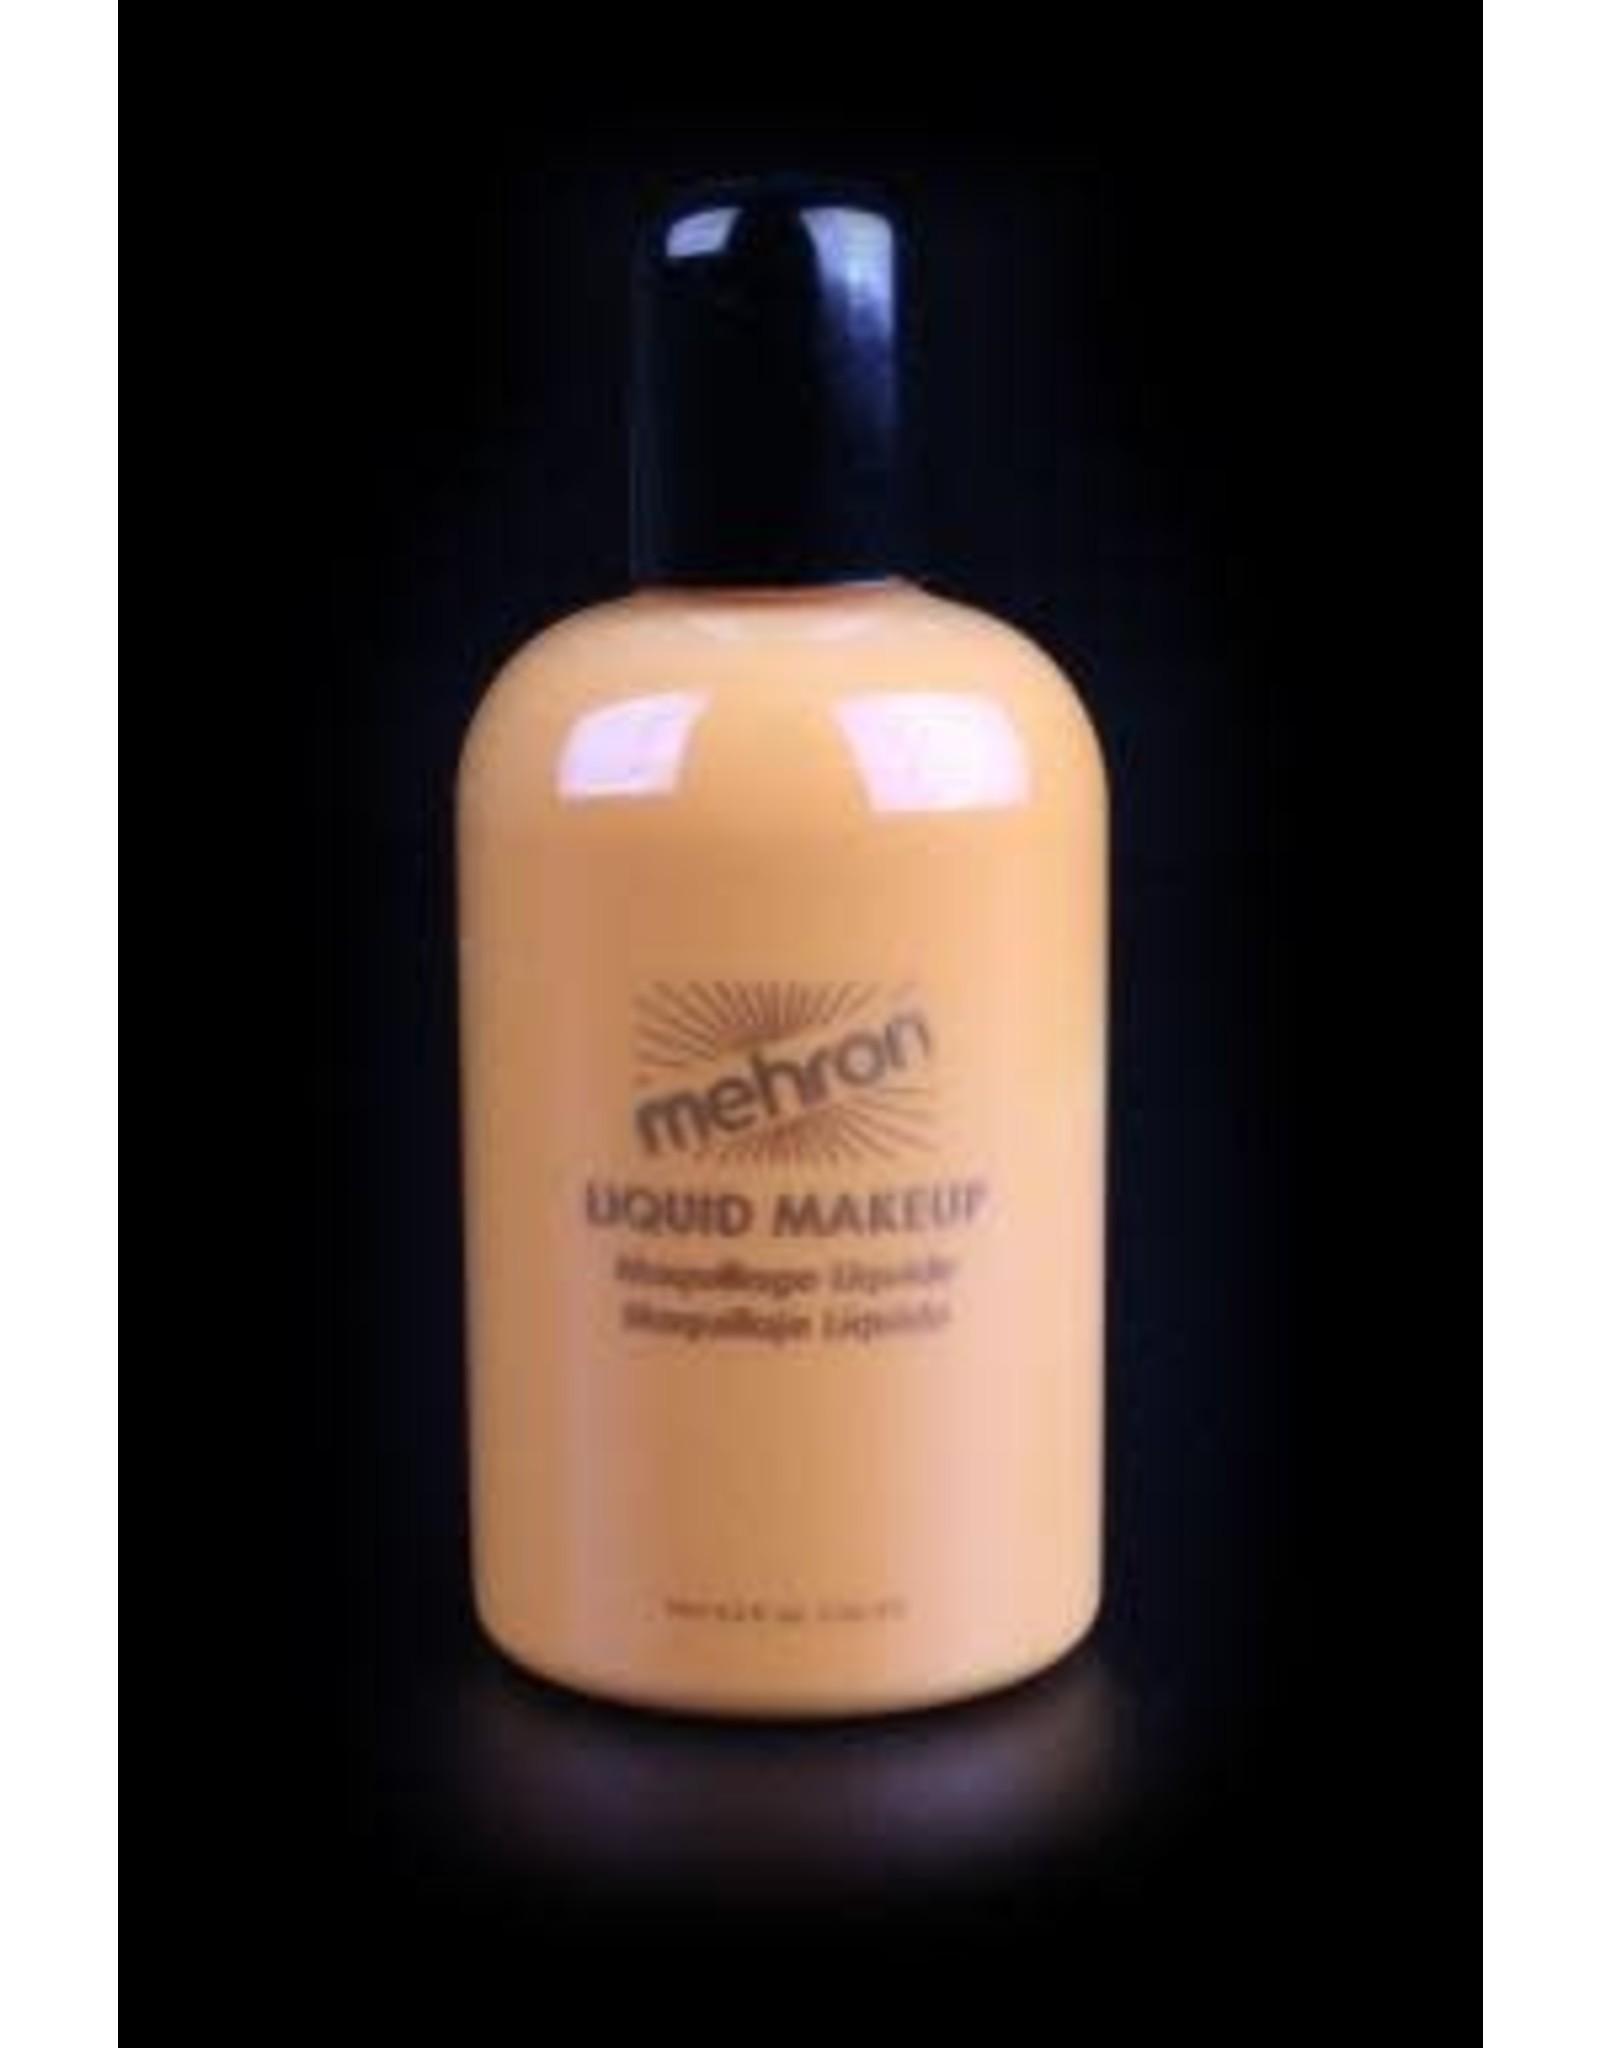 Mehron Liquid Makeup - 4.5oz.